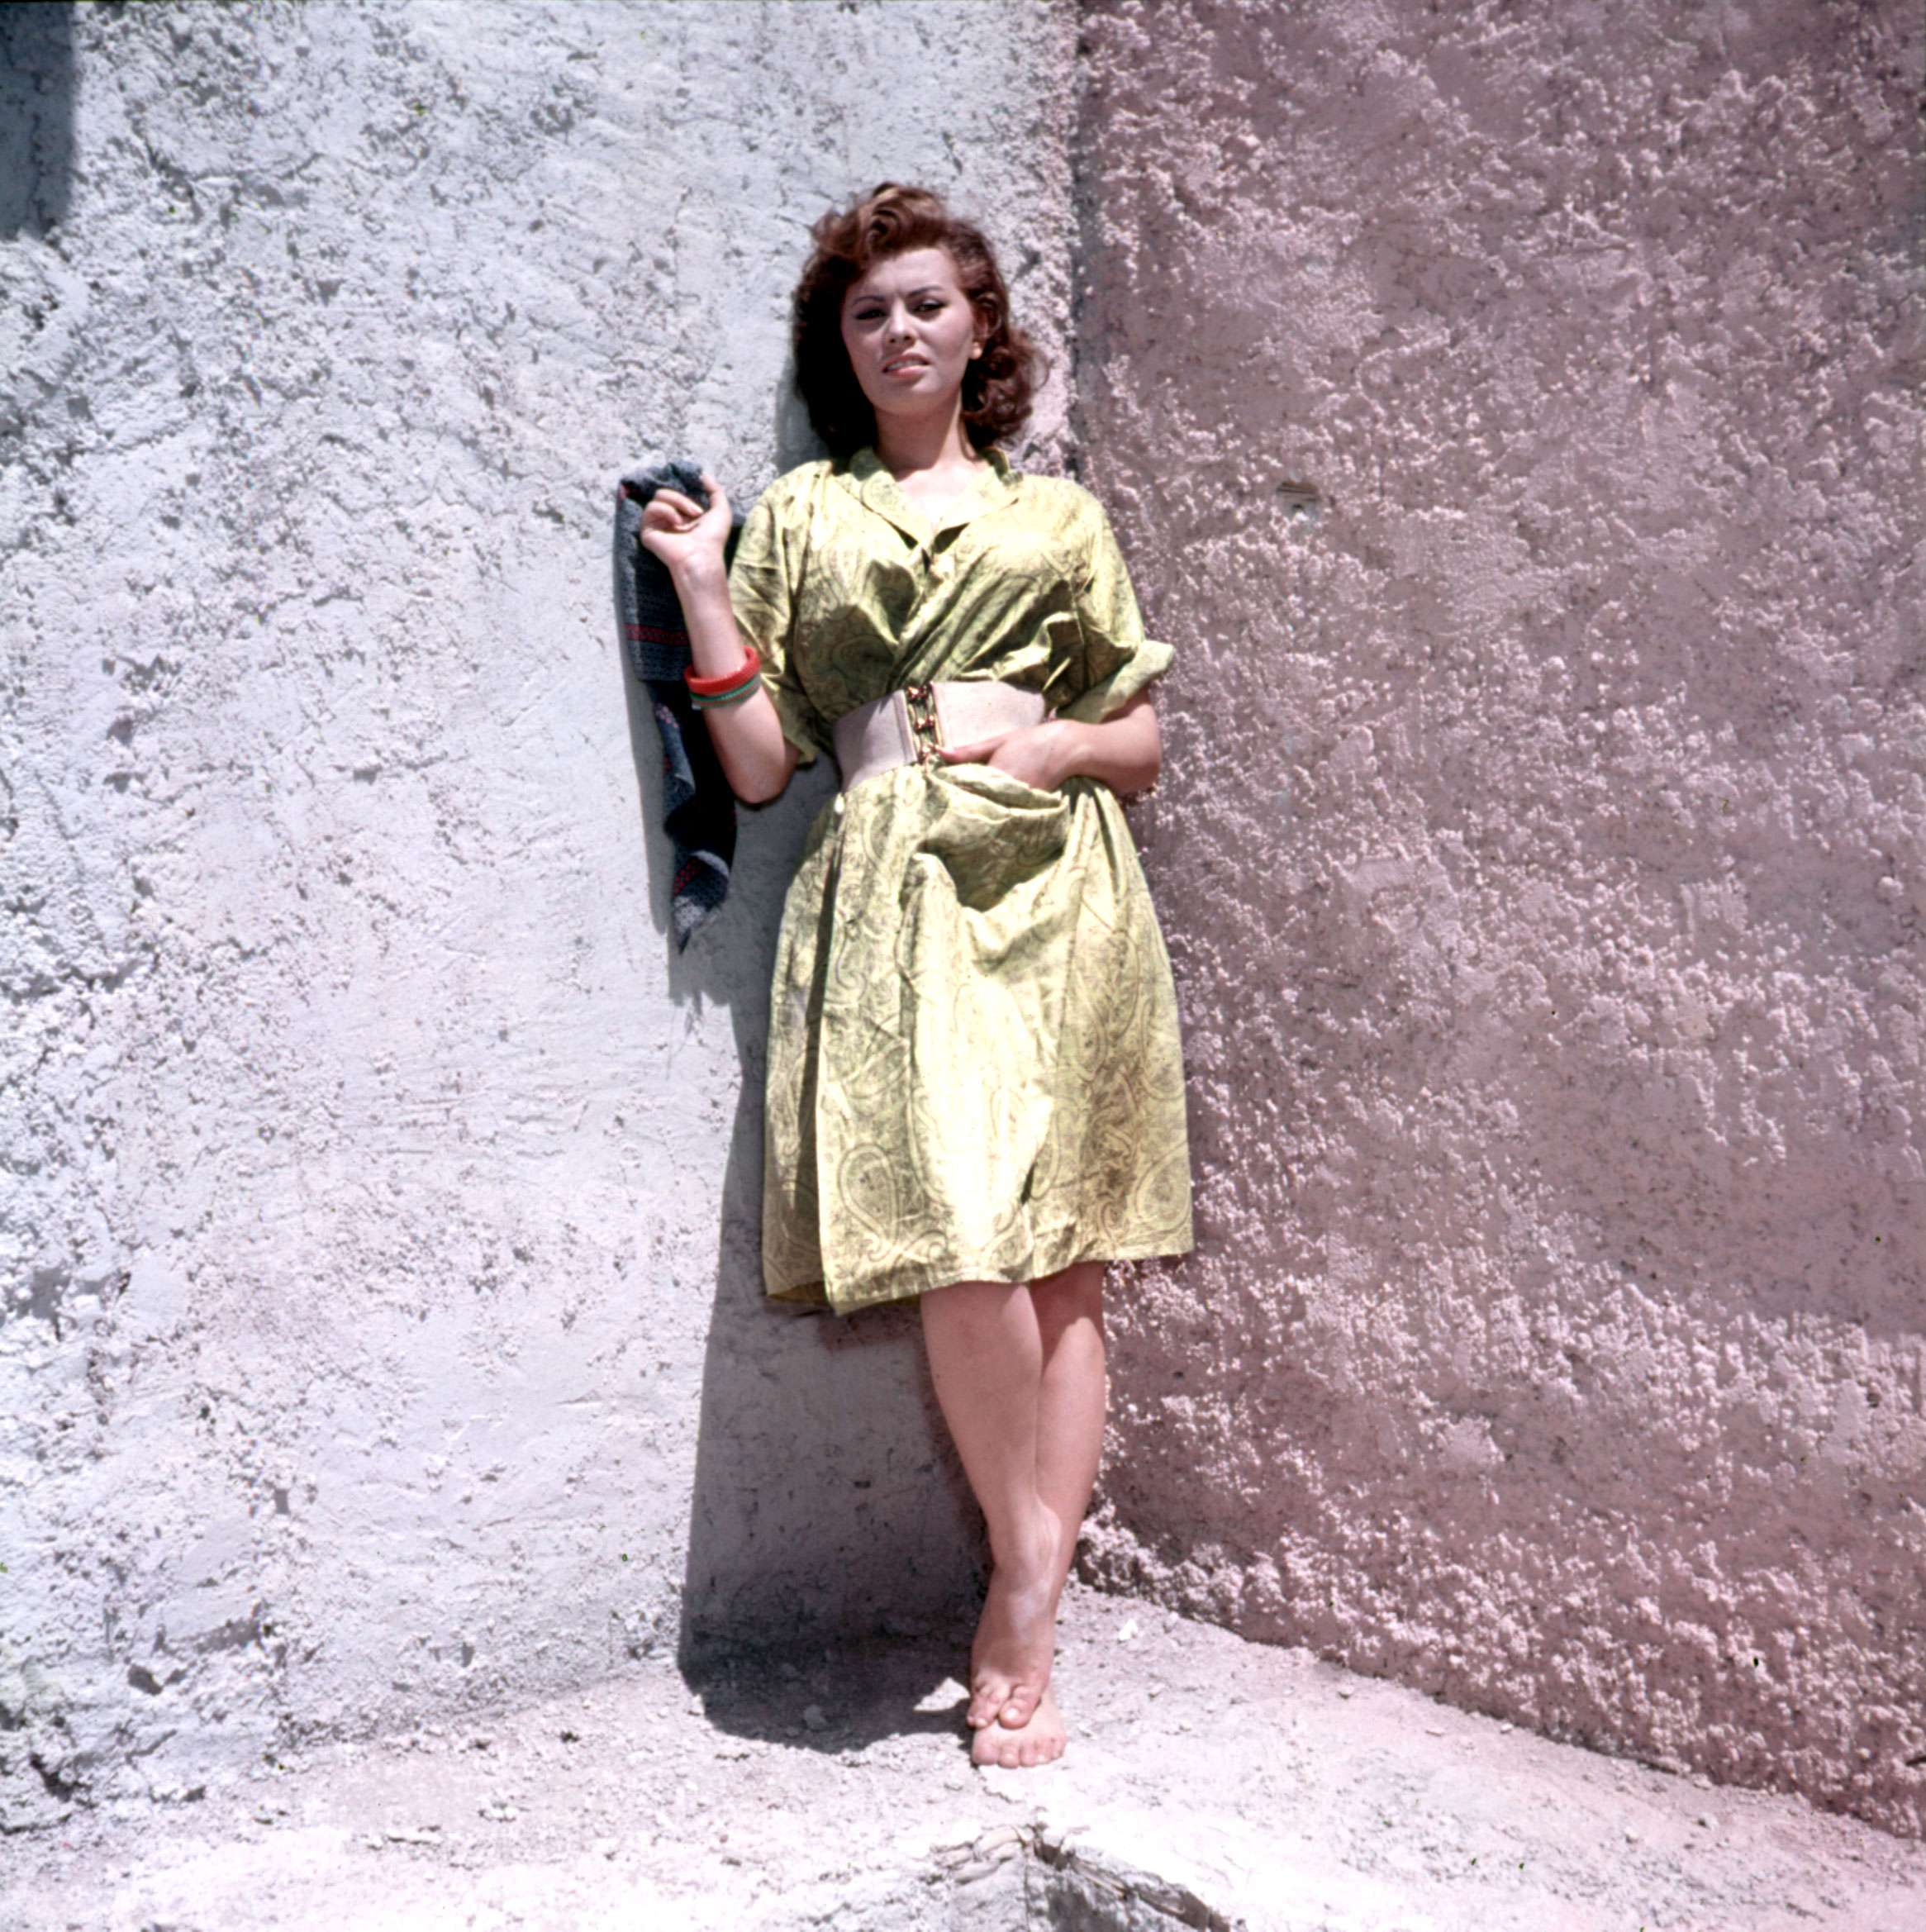 https://pics.wikifeet.com/Sophia-Loren-Feet-281770.jpg